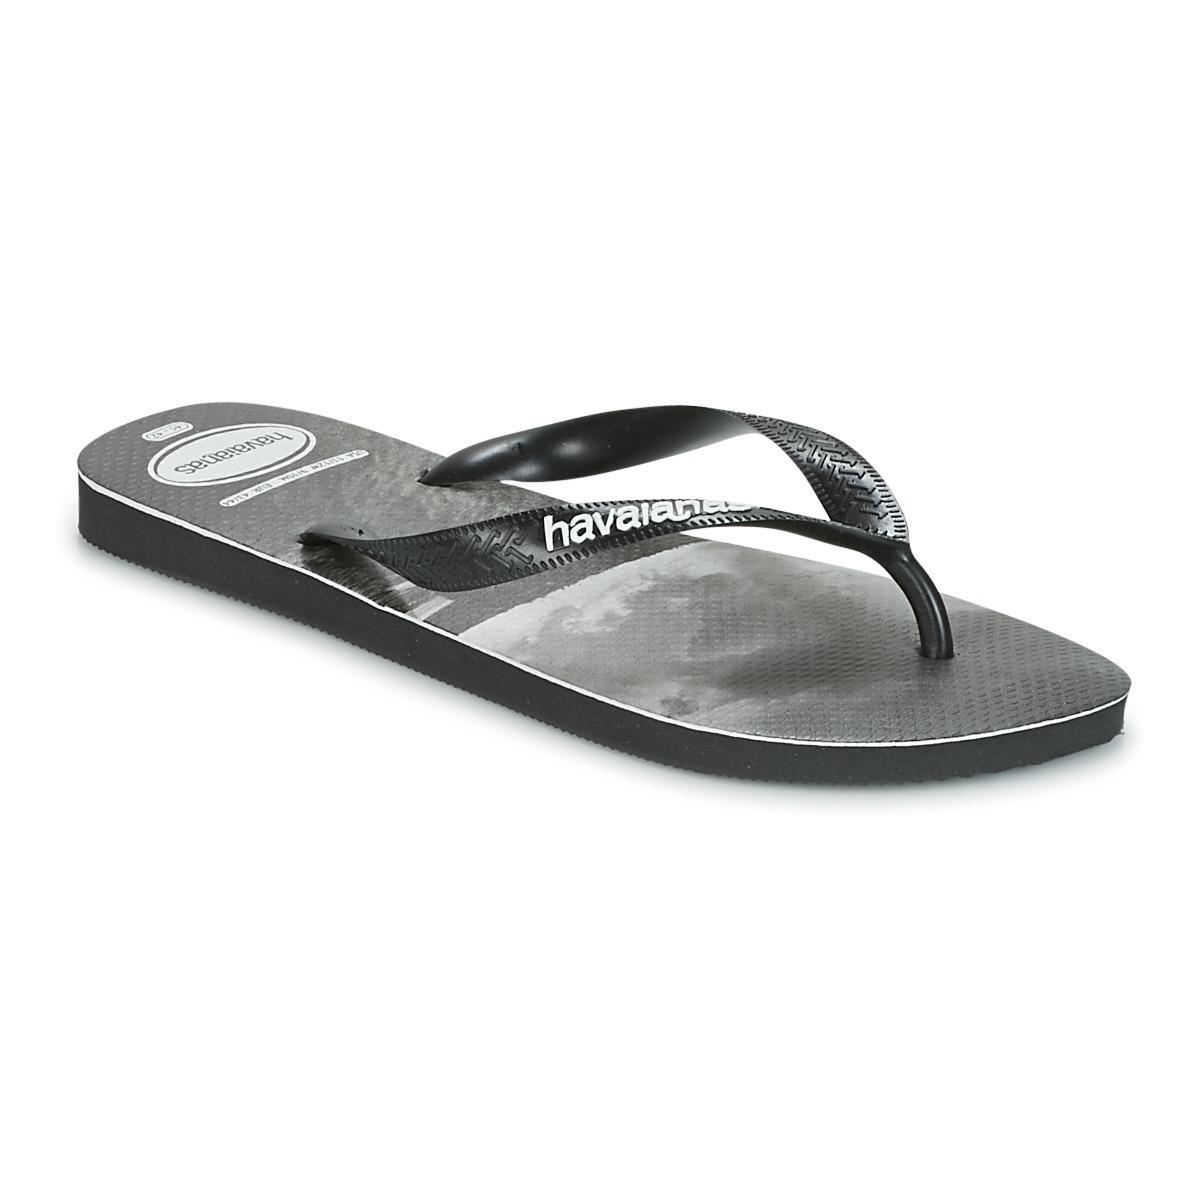 94baaebe4 Havaianas Top Photoprint Flip Flops   Sandals (shoes) in Black for ...